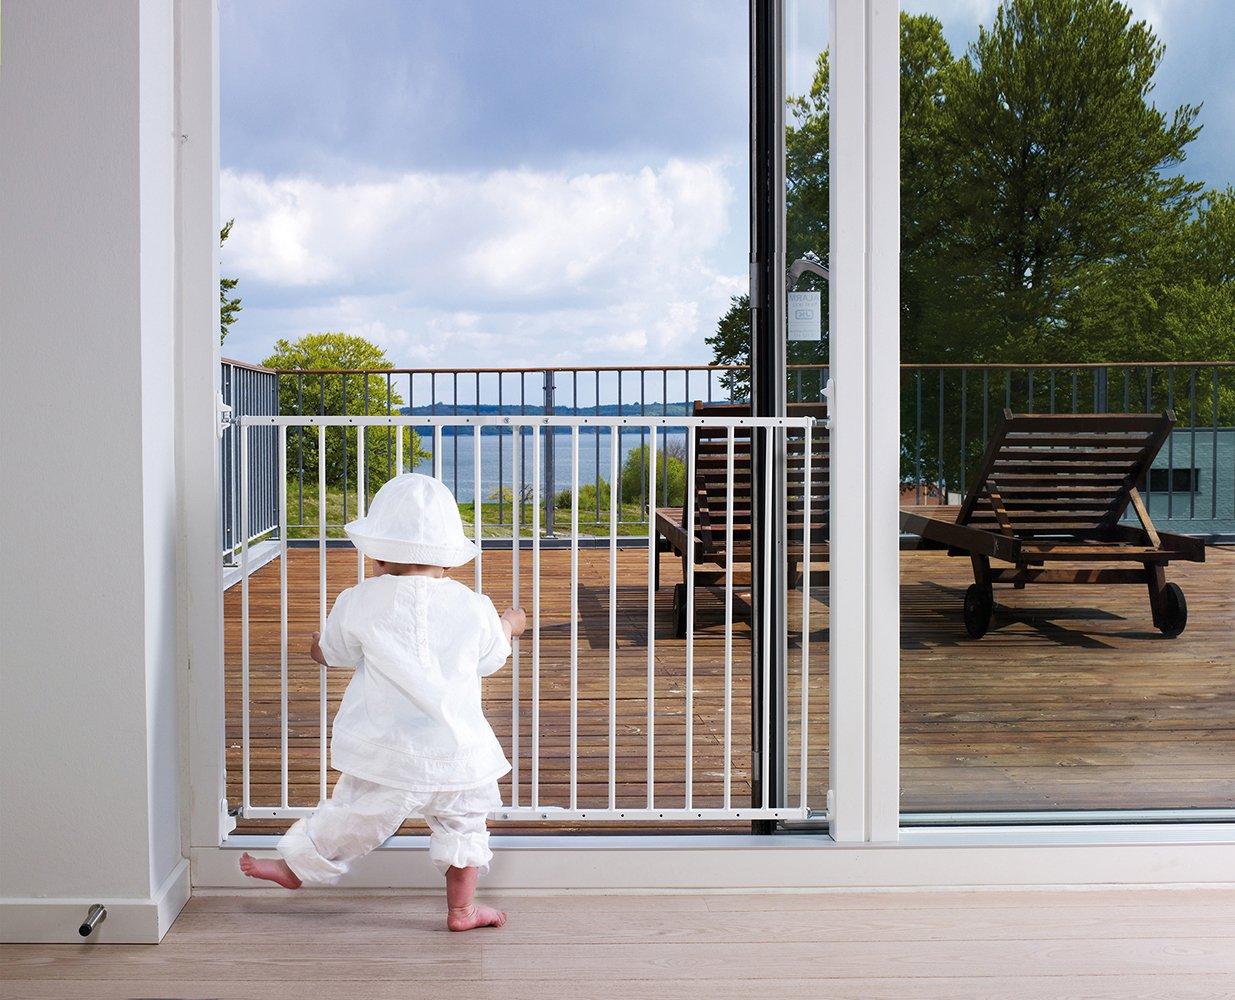 BabyDan Multidan Extending Metal Safety Gate, White